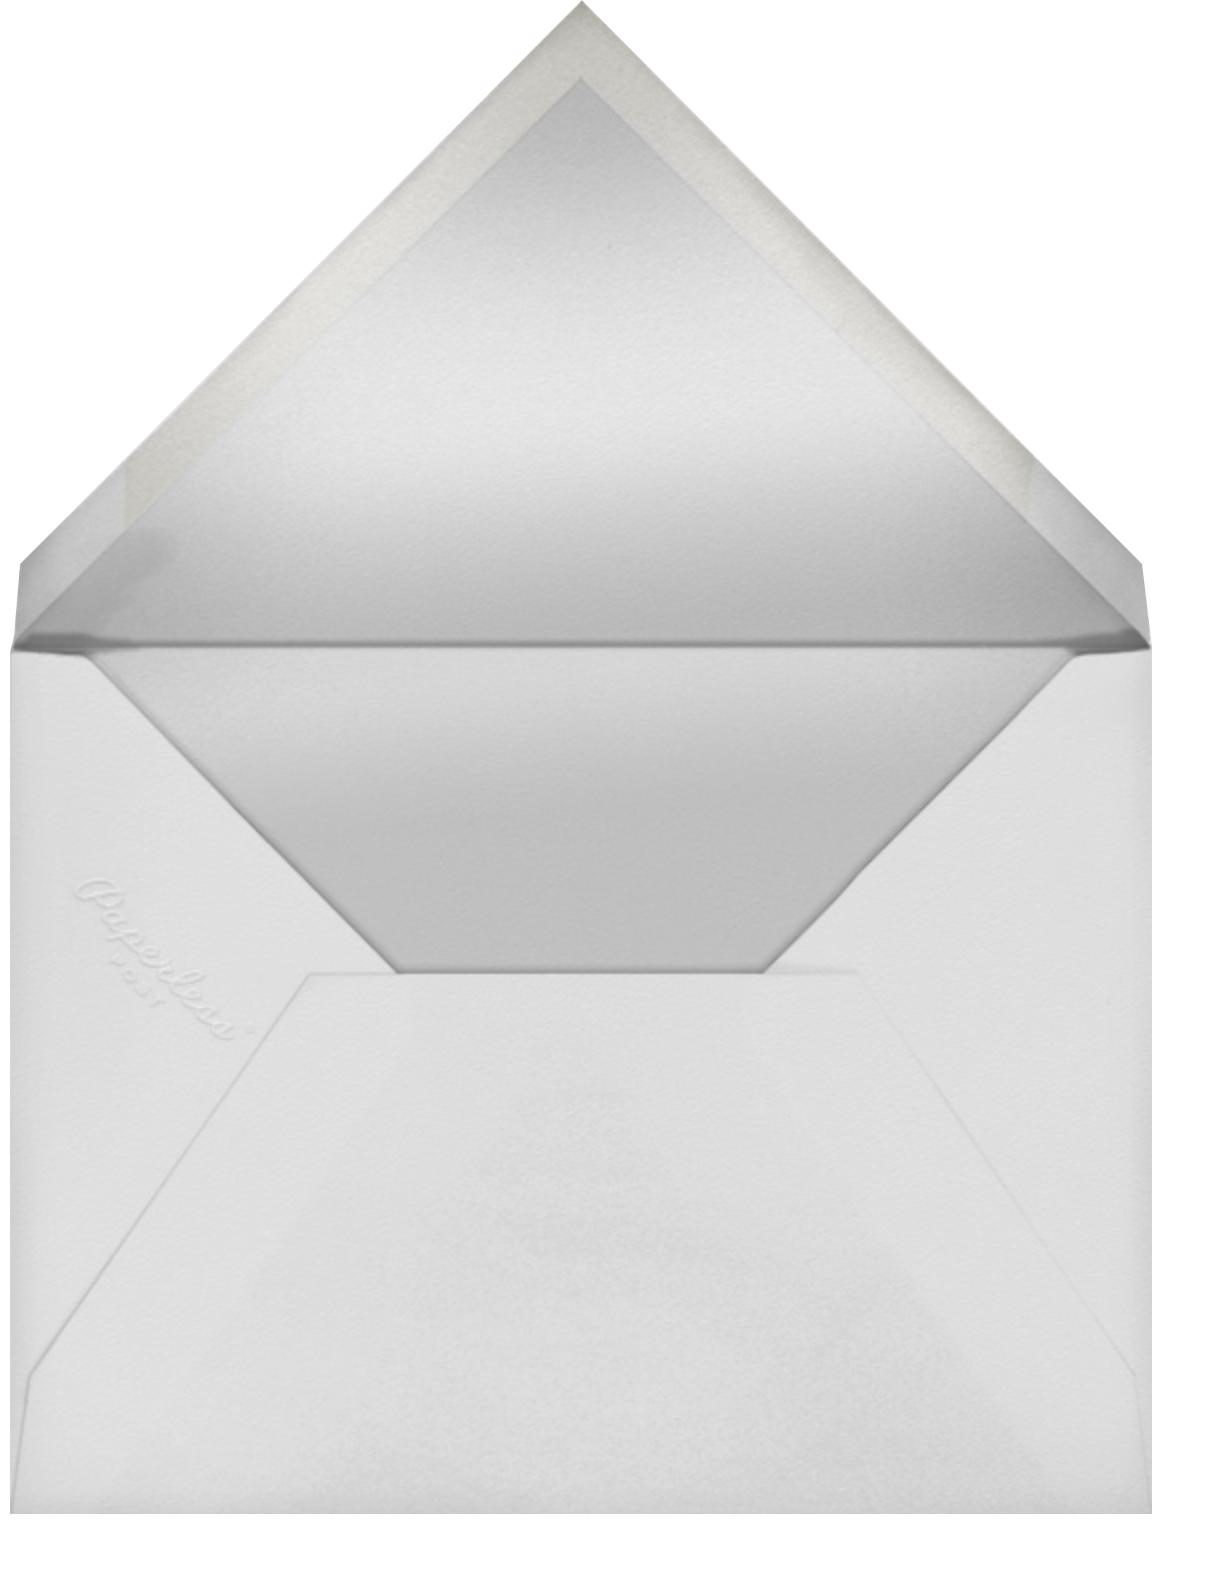 Cream (Square) - Paperless Post - General entertaining - envelope back